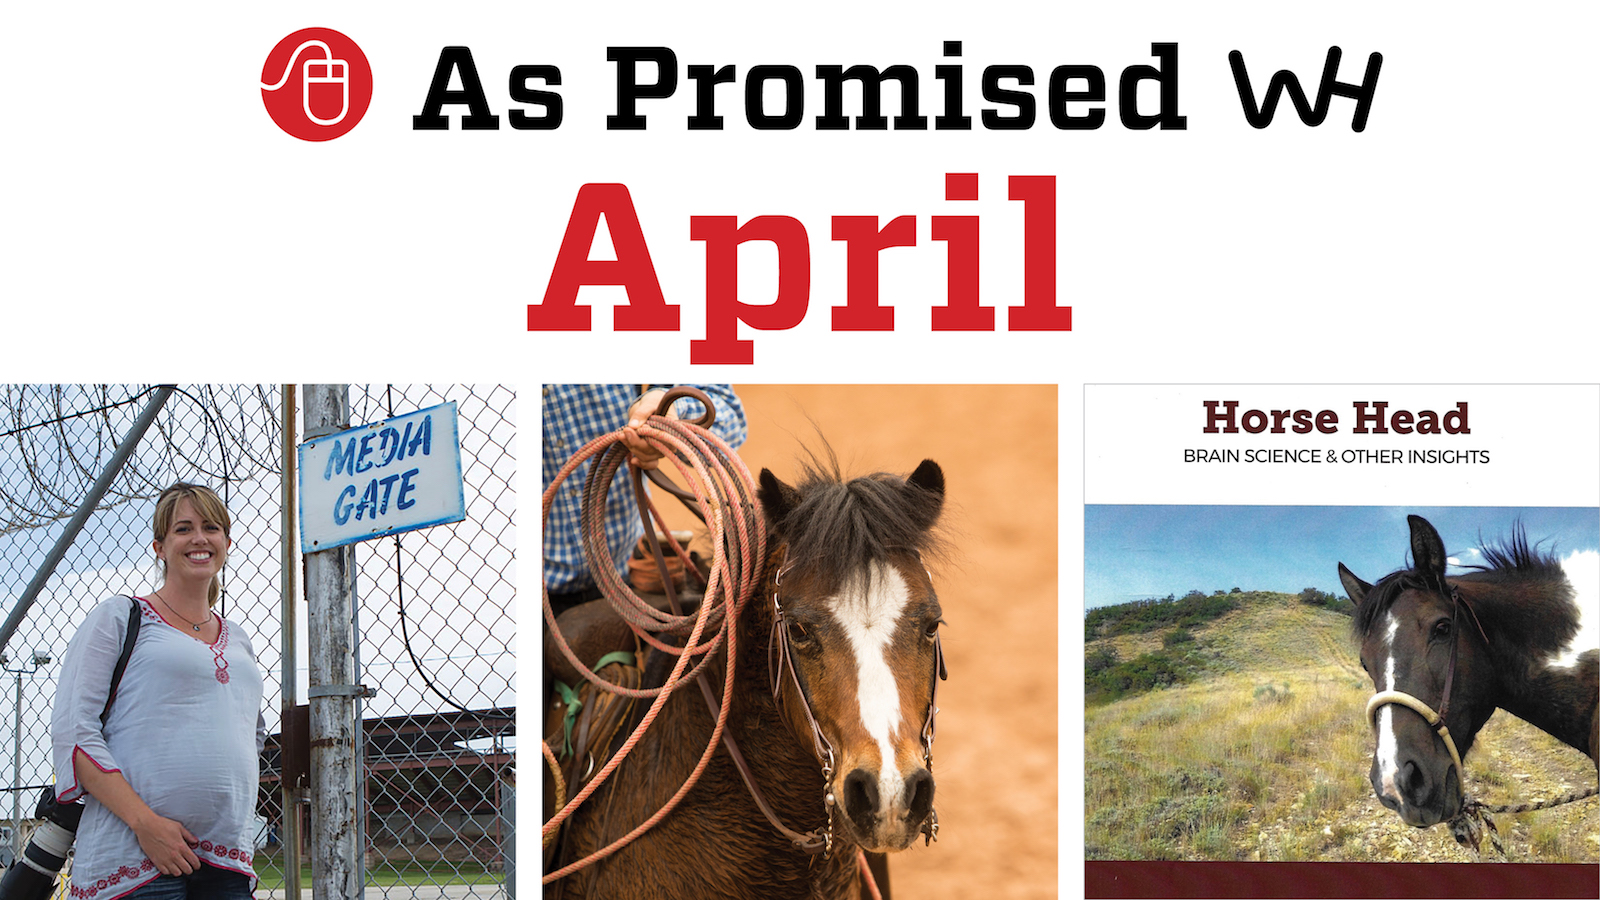 April 2020 promised content